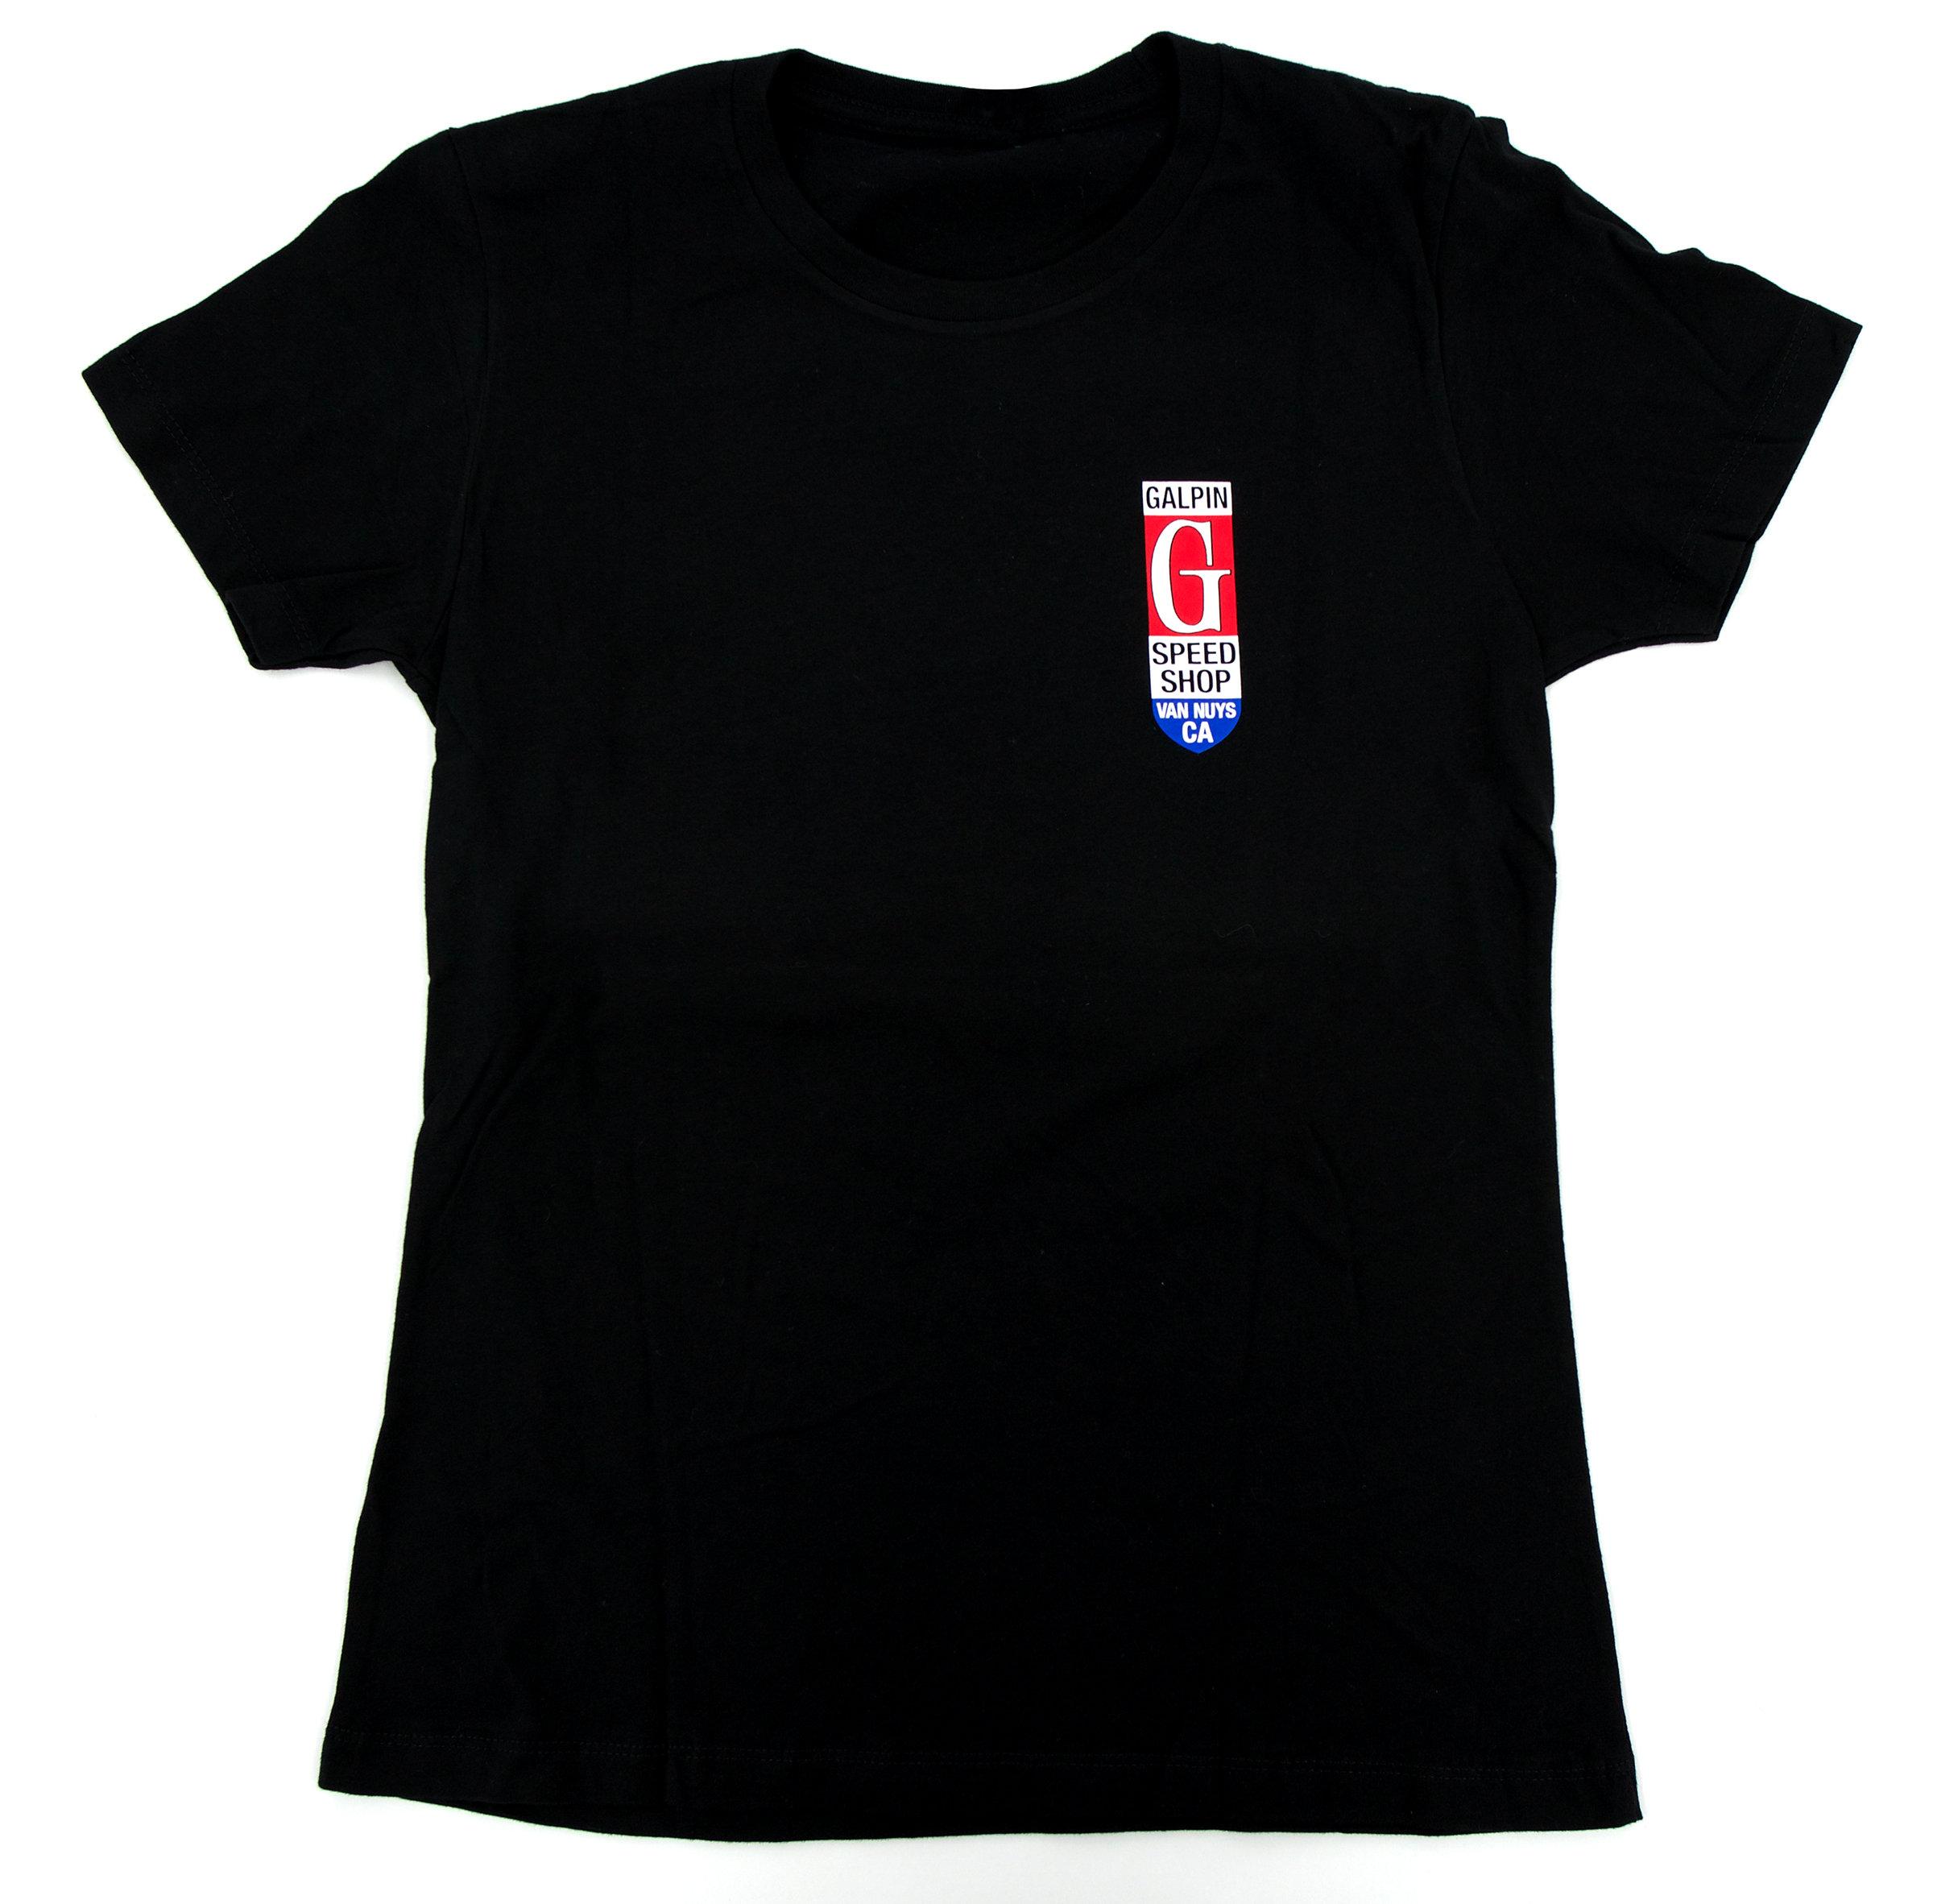 GAS Galpin Speed Shop T-Shirt